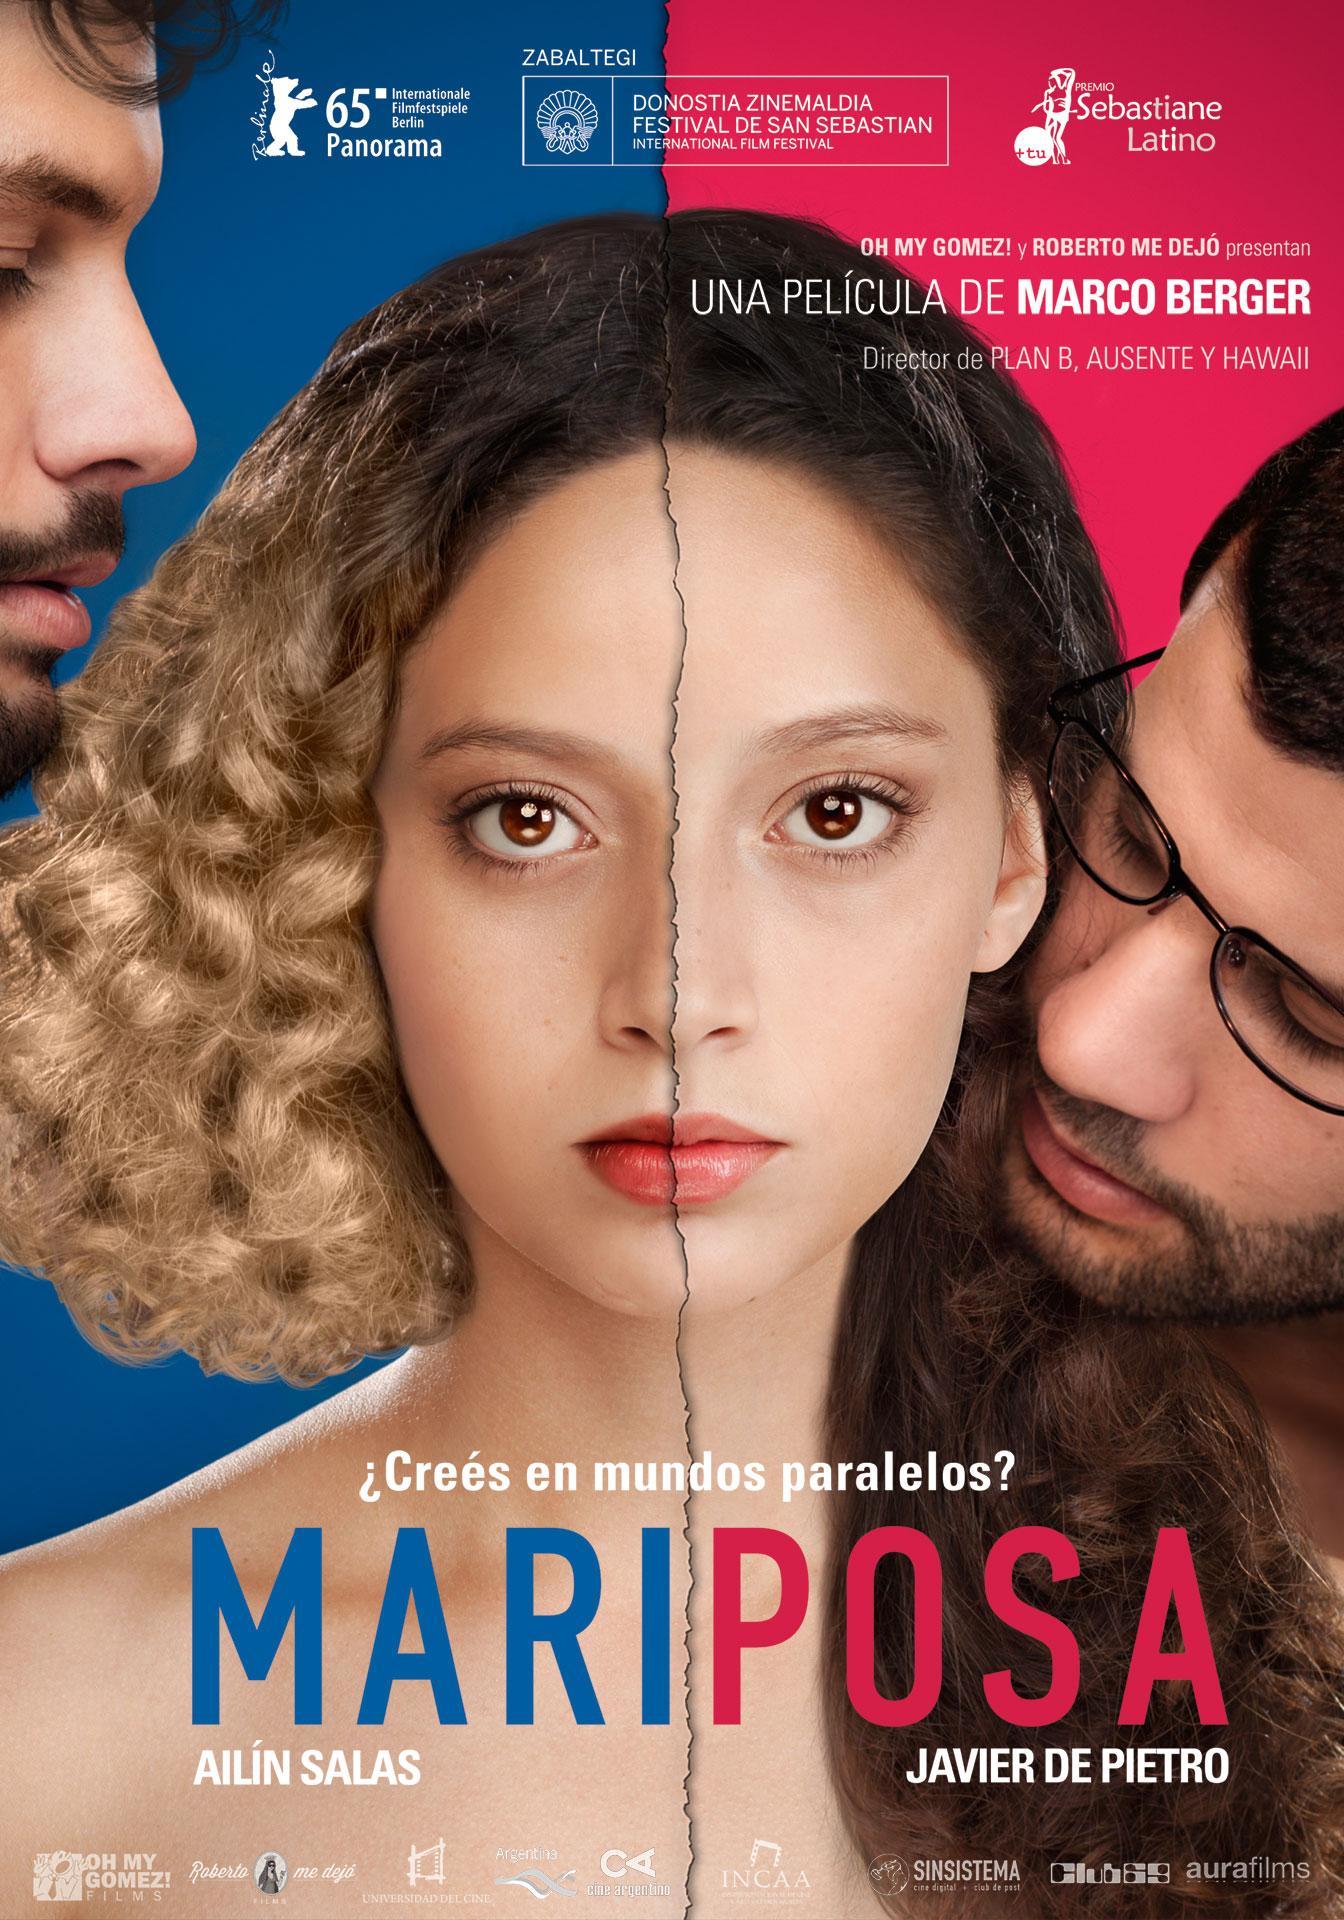 Ver Mariposa Online (2015) Gratis HD Pelicula Completa